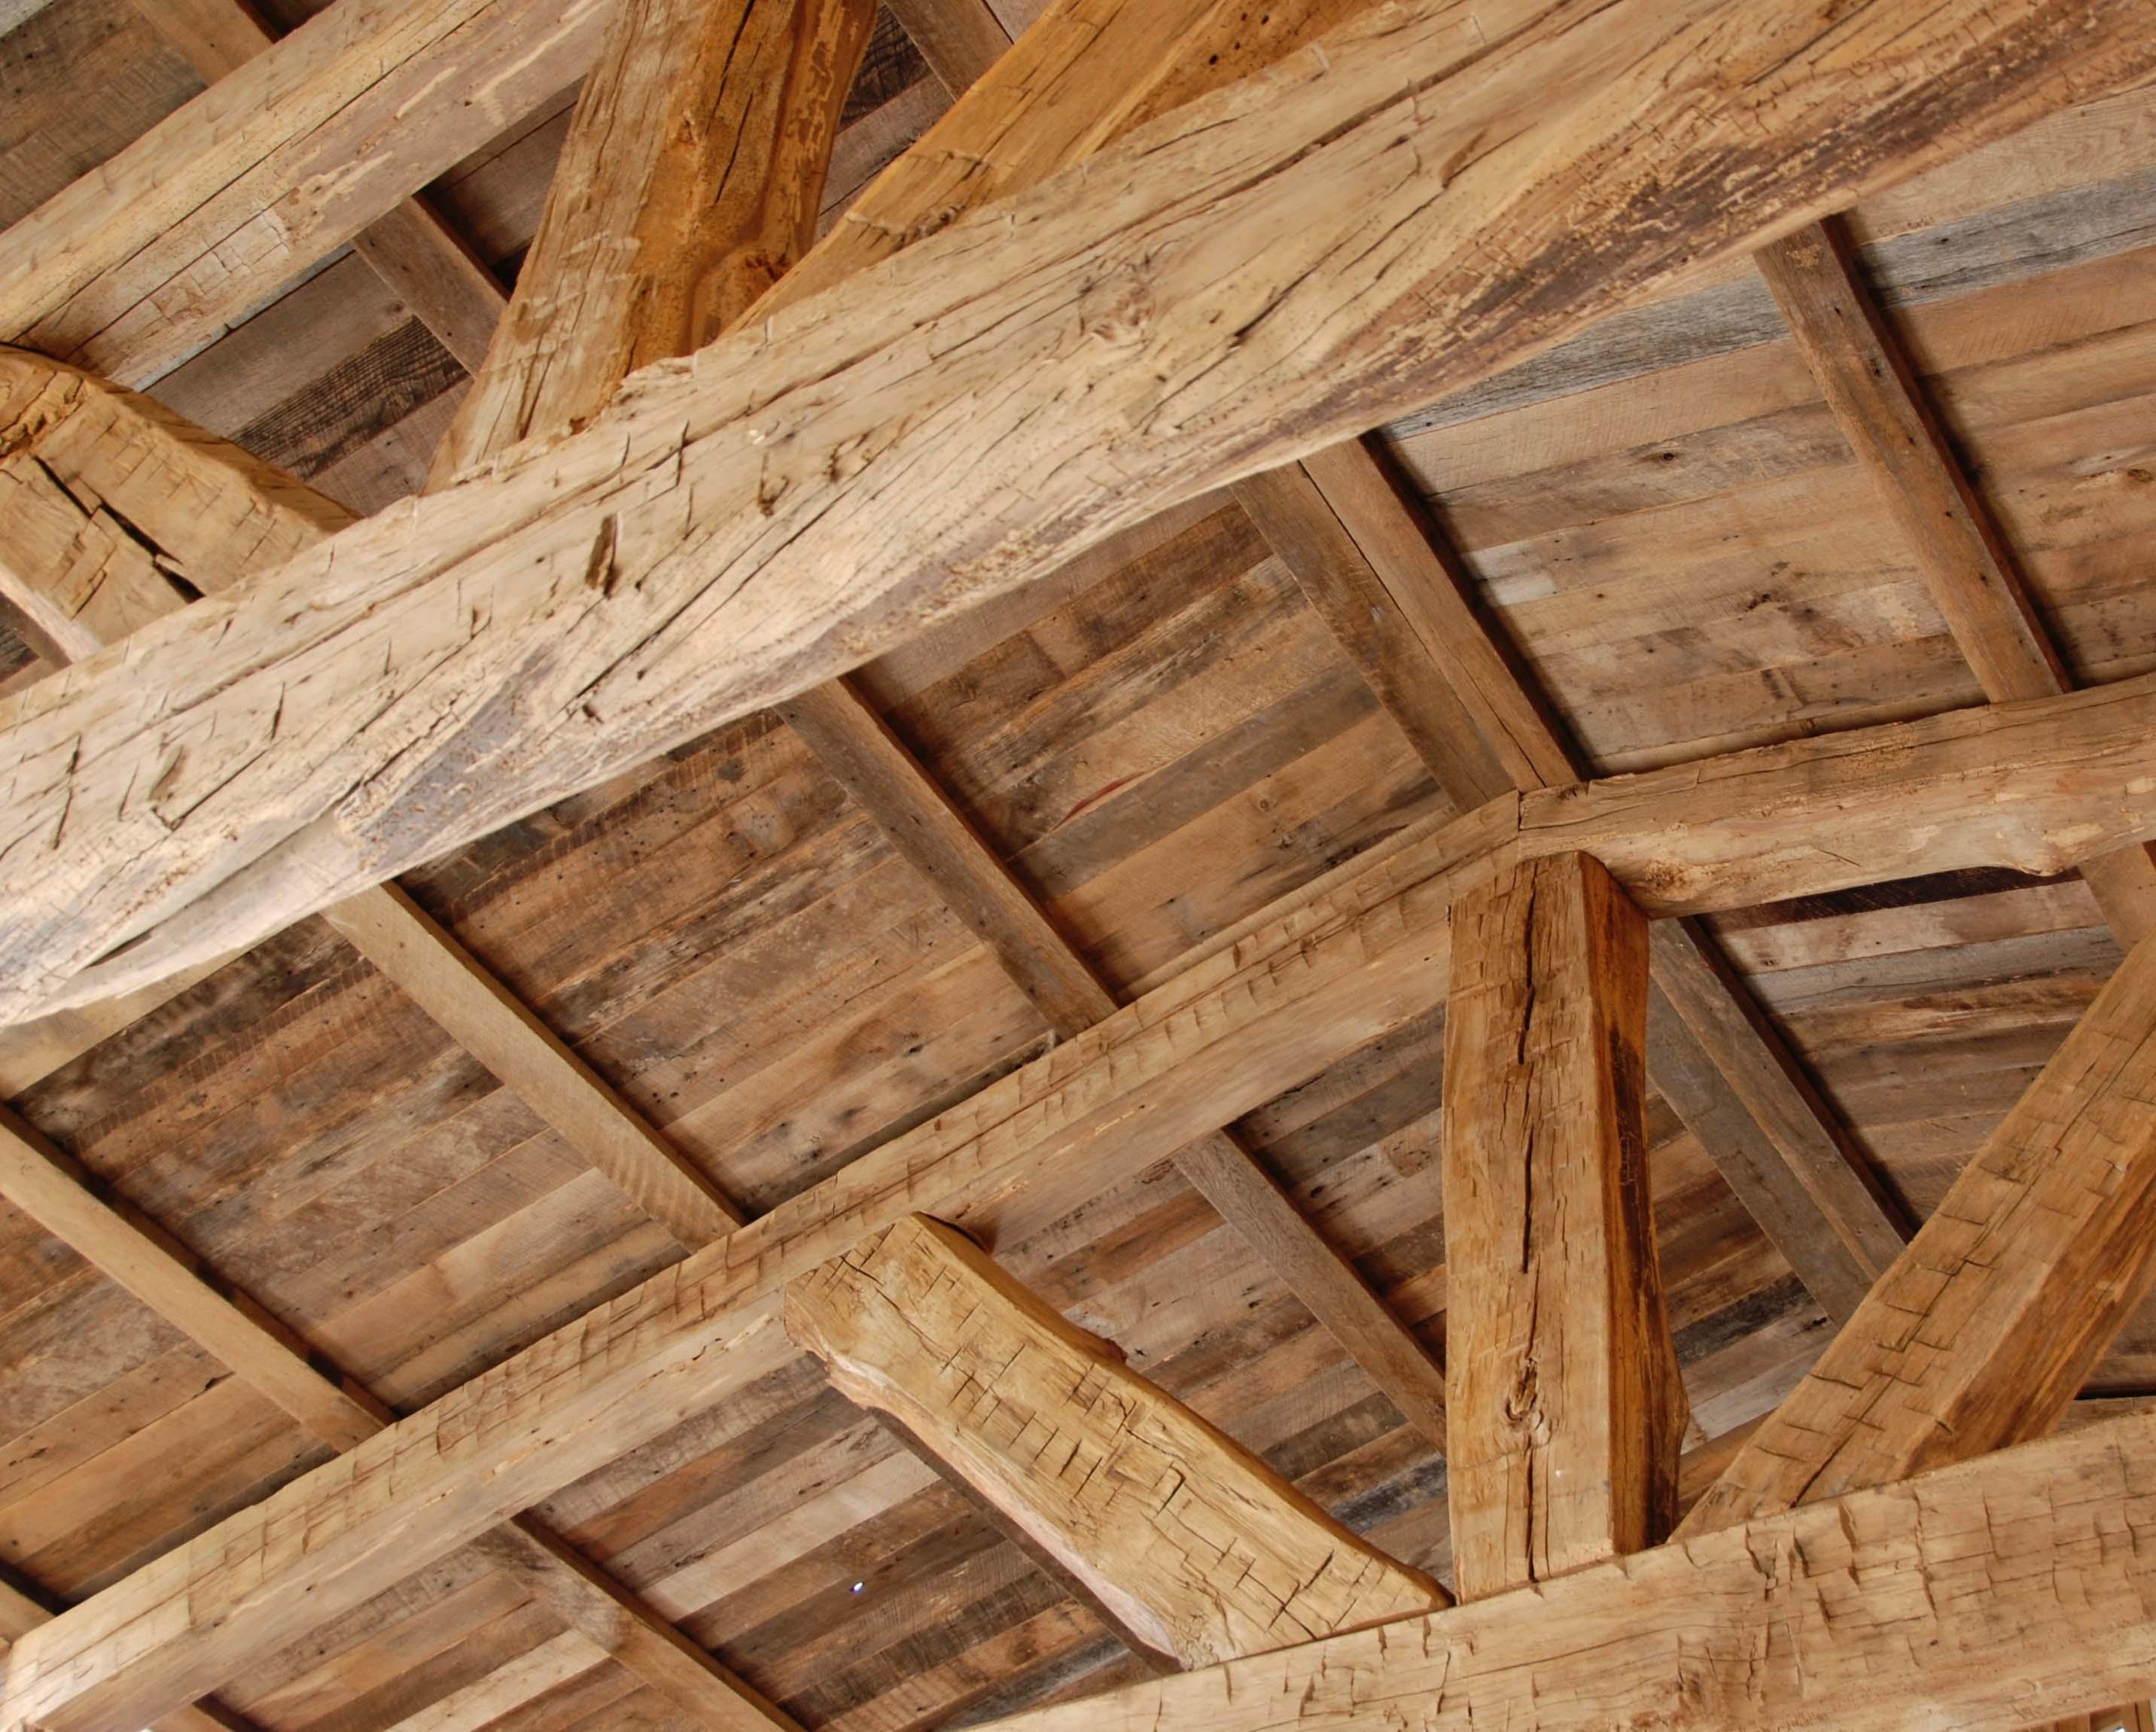 edge hardwood beams06 - Reclaimed Hardwood Barn Timbers